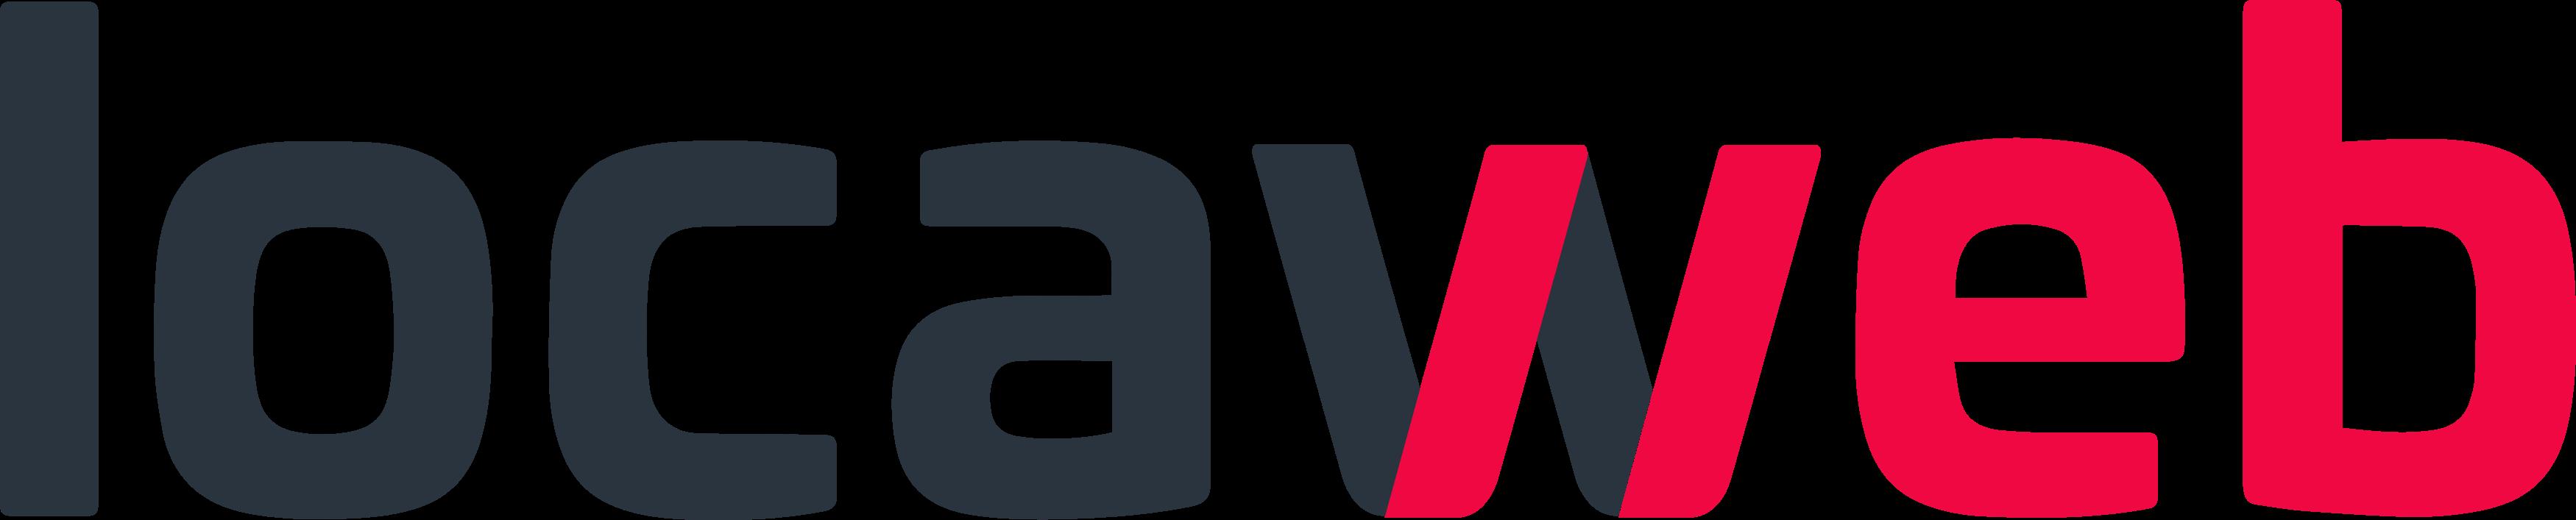 Locaweb logo.